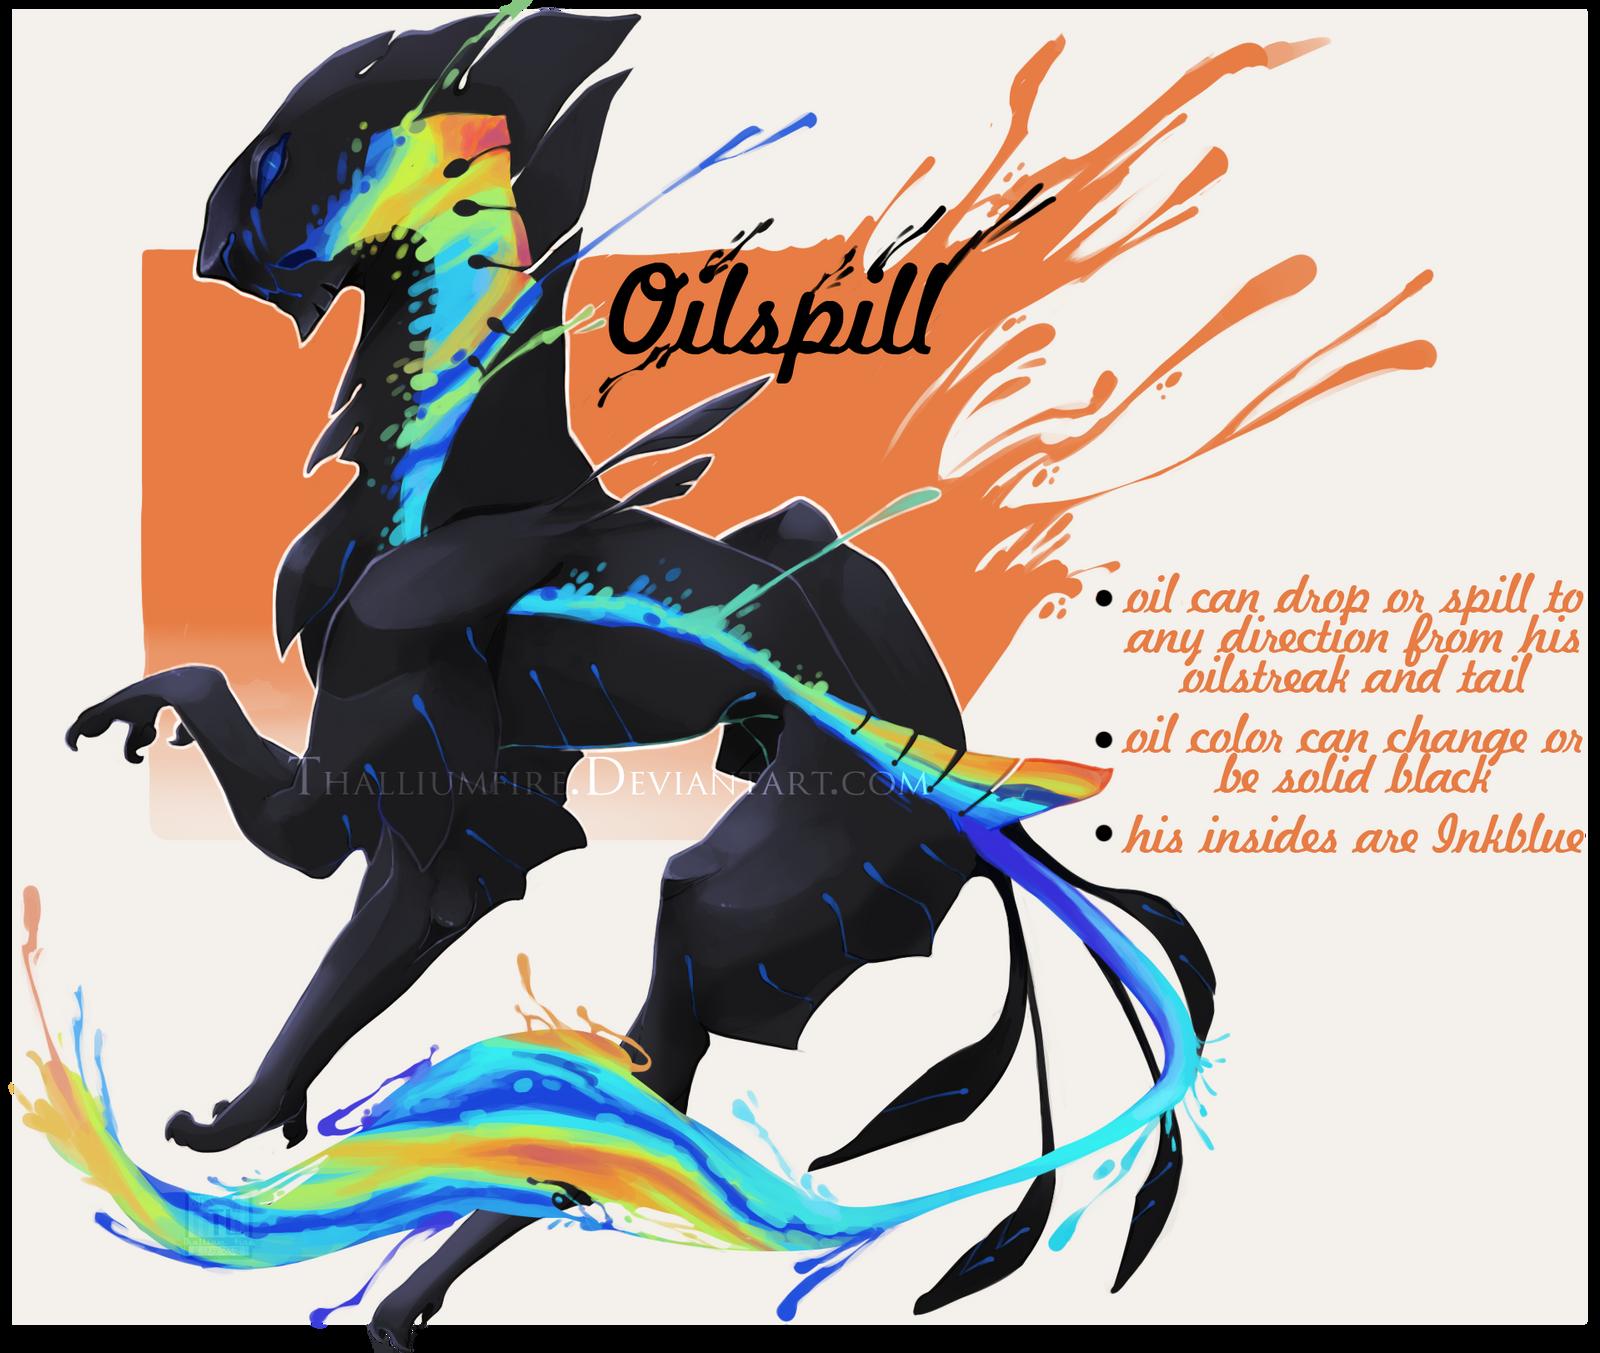 OilSpill by Thalliumfire